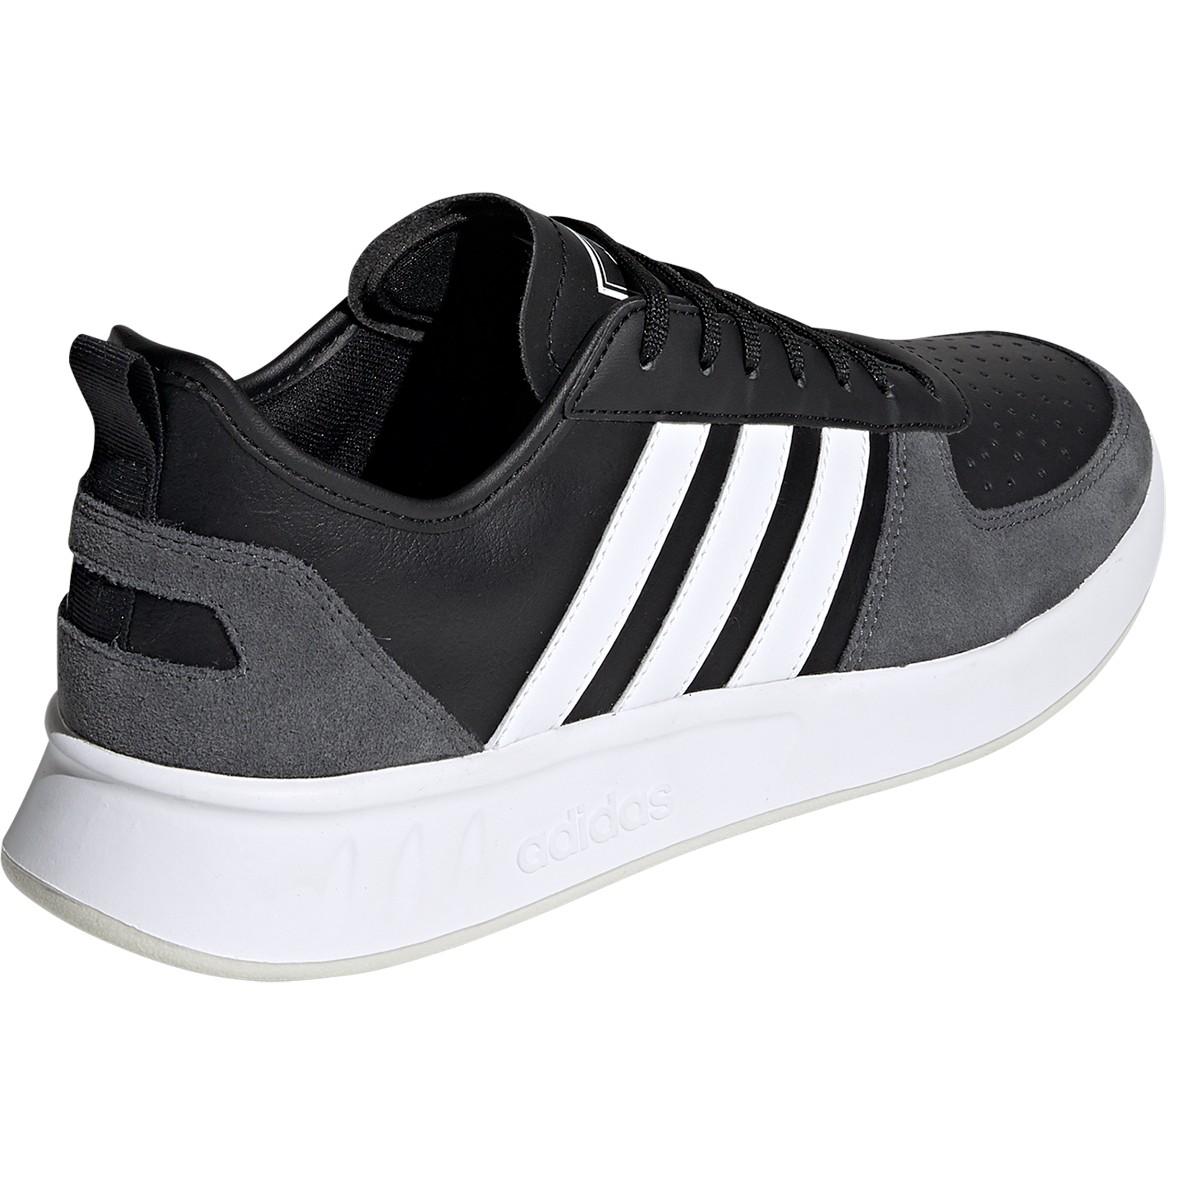 ADIDAS COURT 80S SHOES ADIDAS Men's Shoes | Tennispro